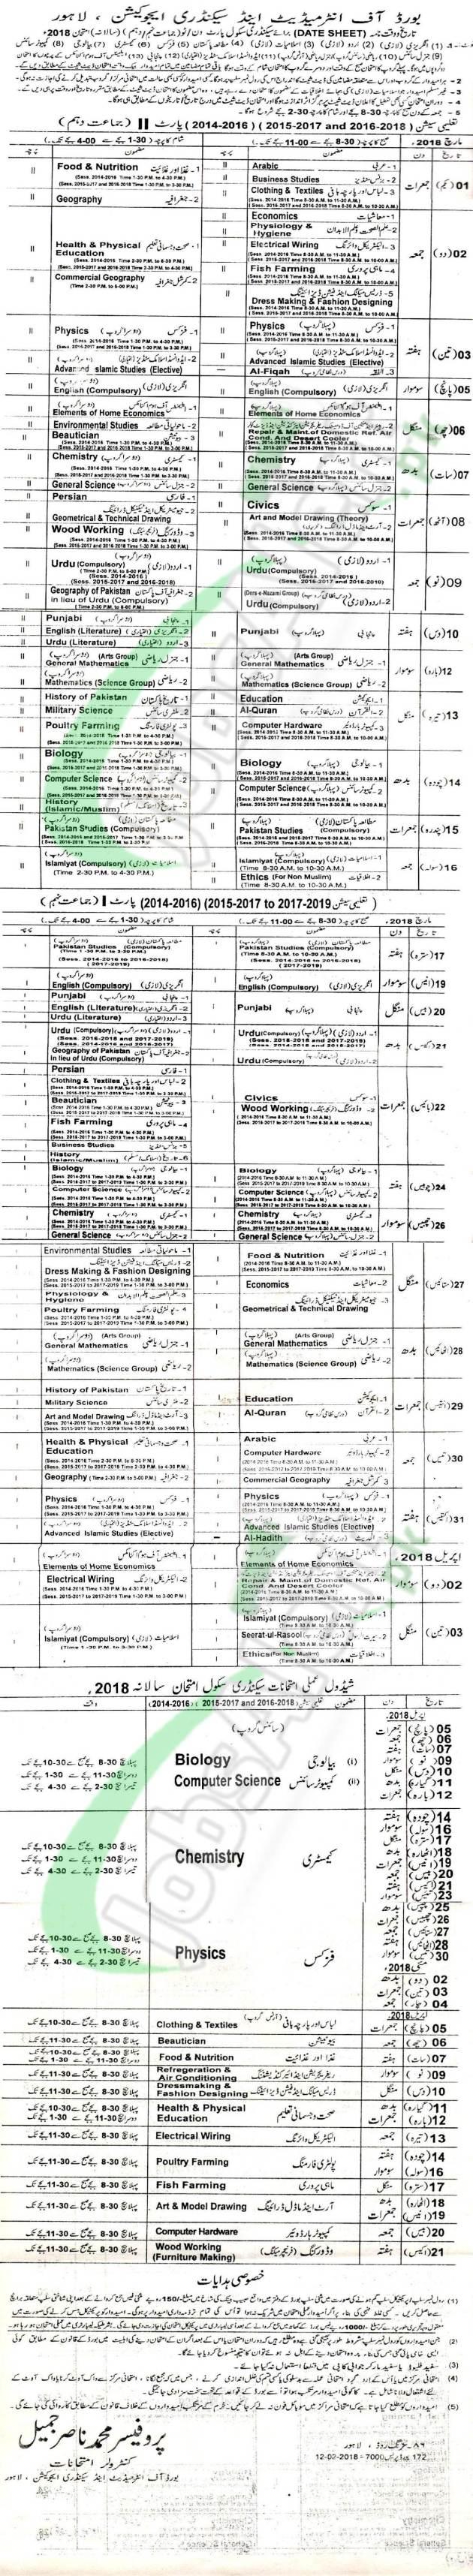 Matric Date Sheet 2018